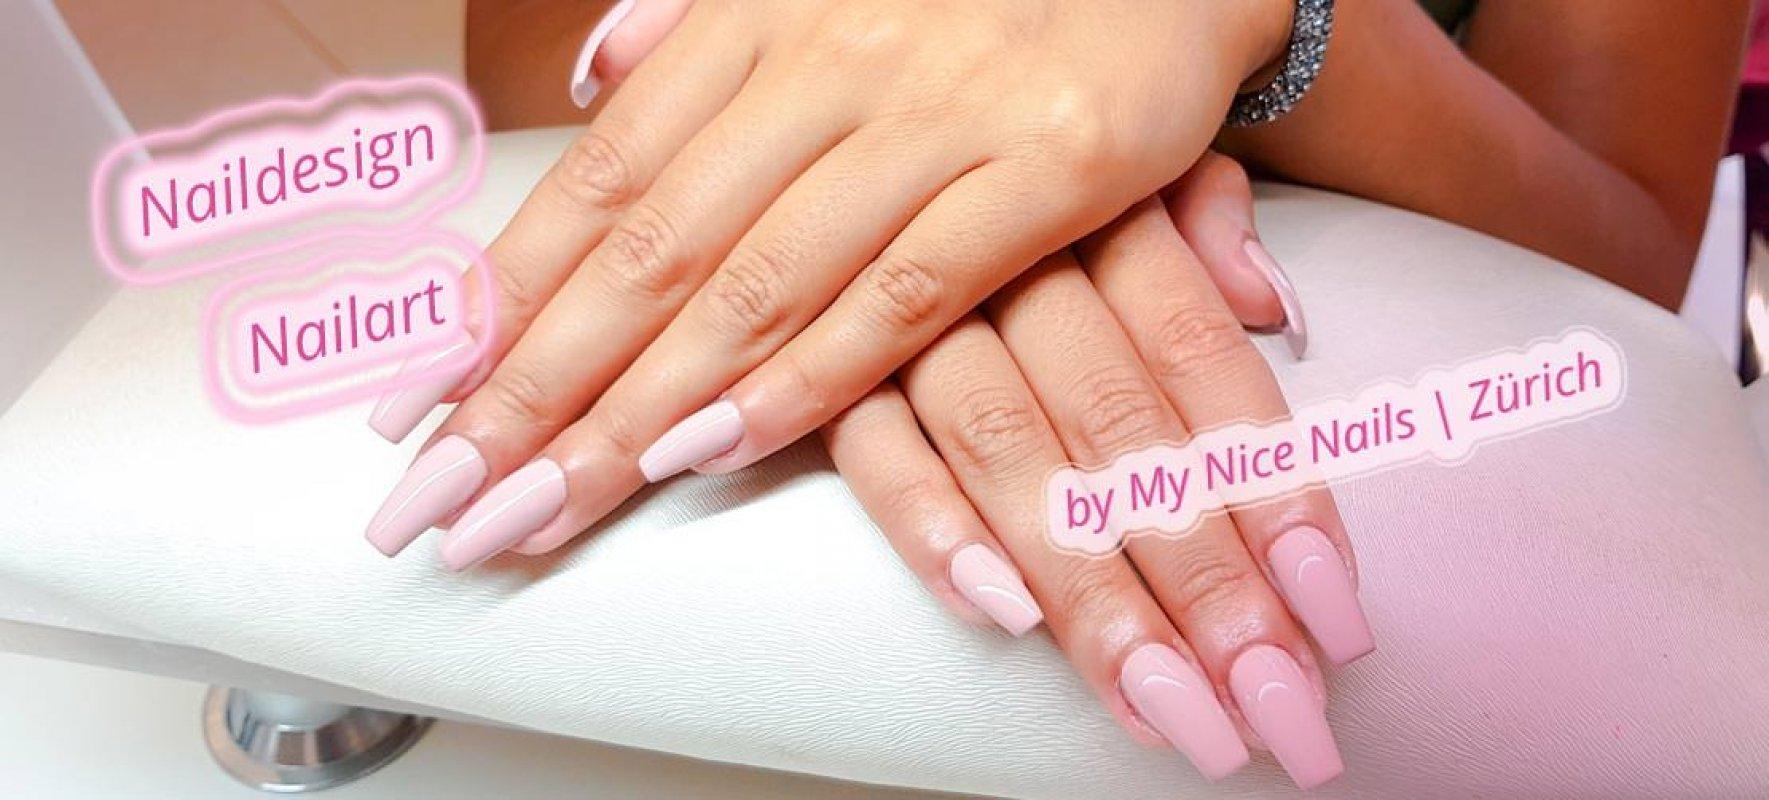 my nice nails 100 nails perfektion freundlichkeit nagelstudio z rich. Black Bedroom Furniture Sets. Home Design Ideas